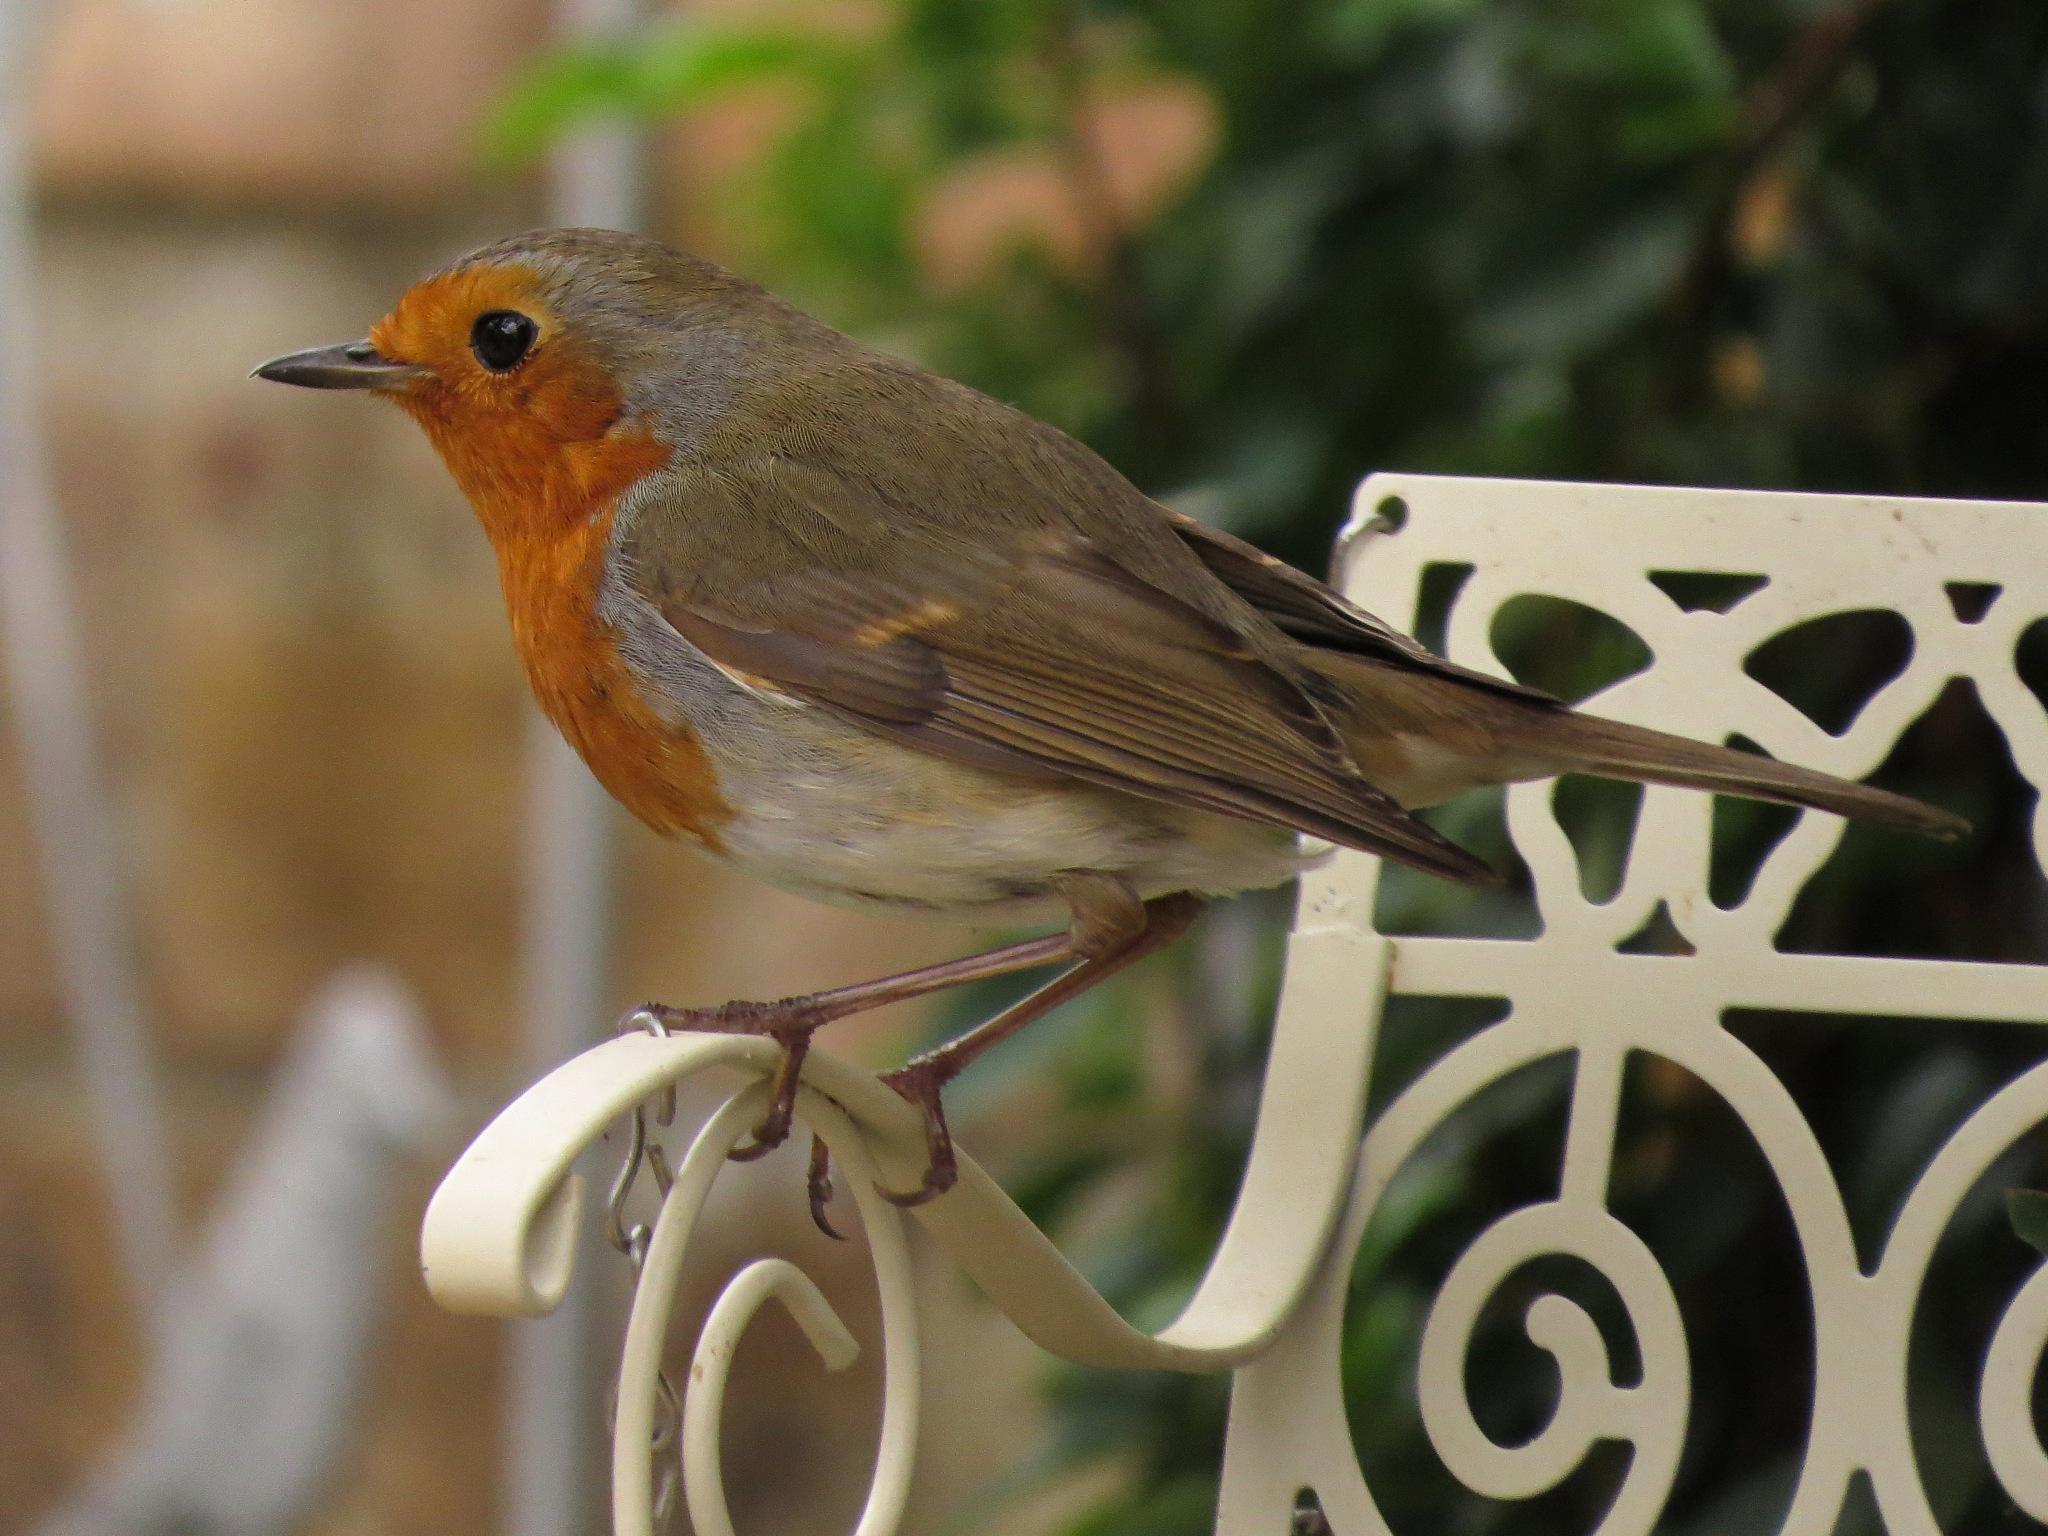 Robin by June